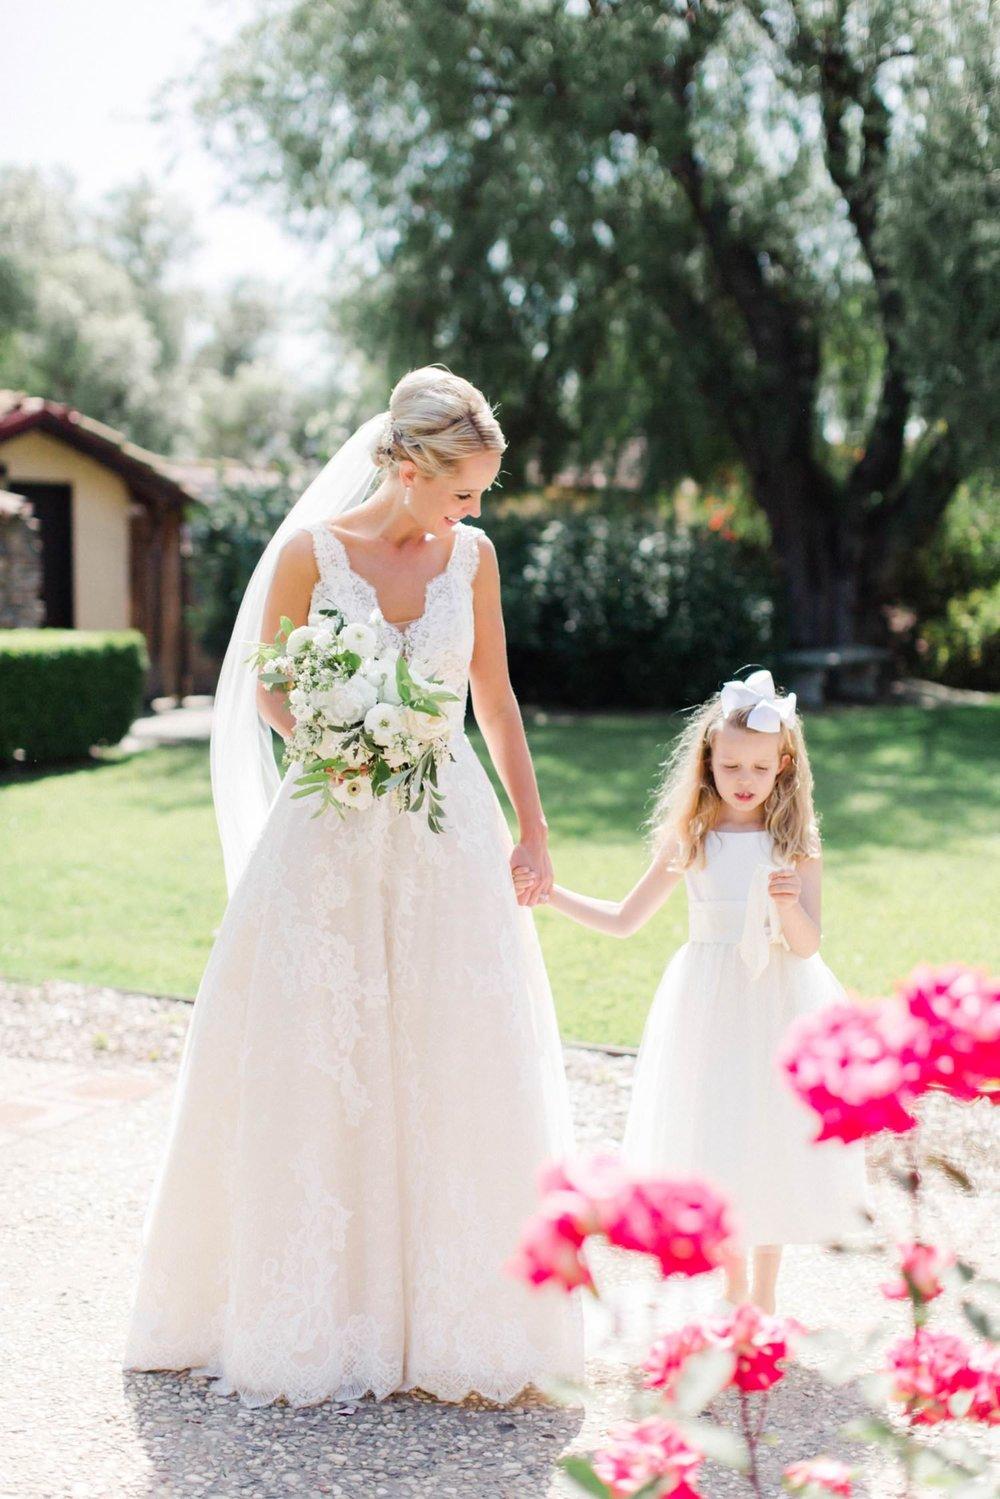 www.santabarbarawedding.com | Anne Delores | Rancho Bella Vista | Wild Heart Events | Bride and Flower Girl